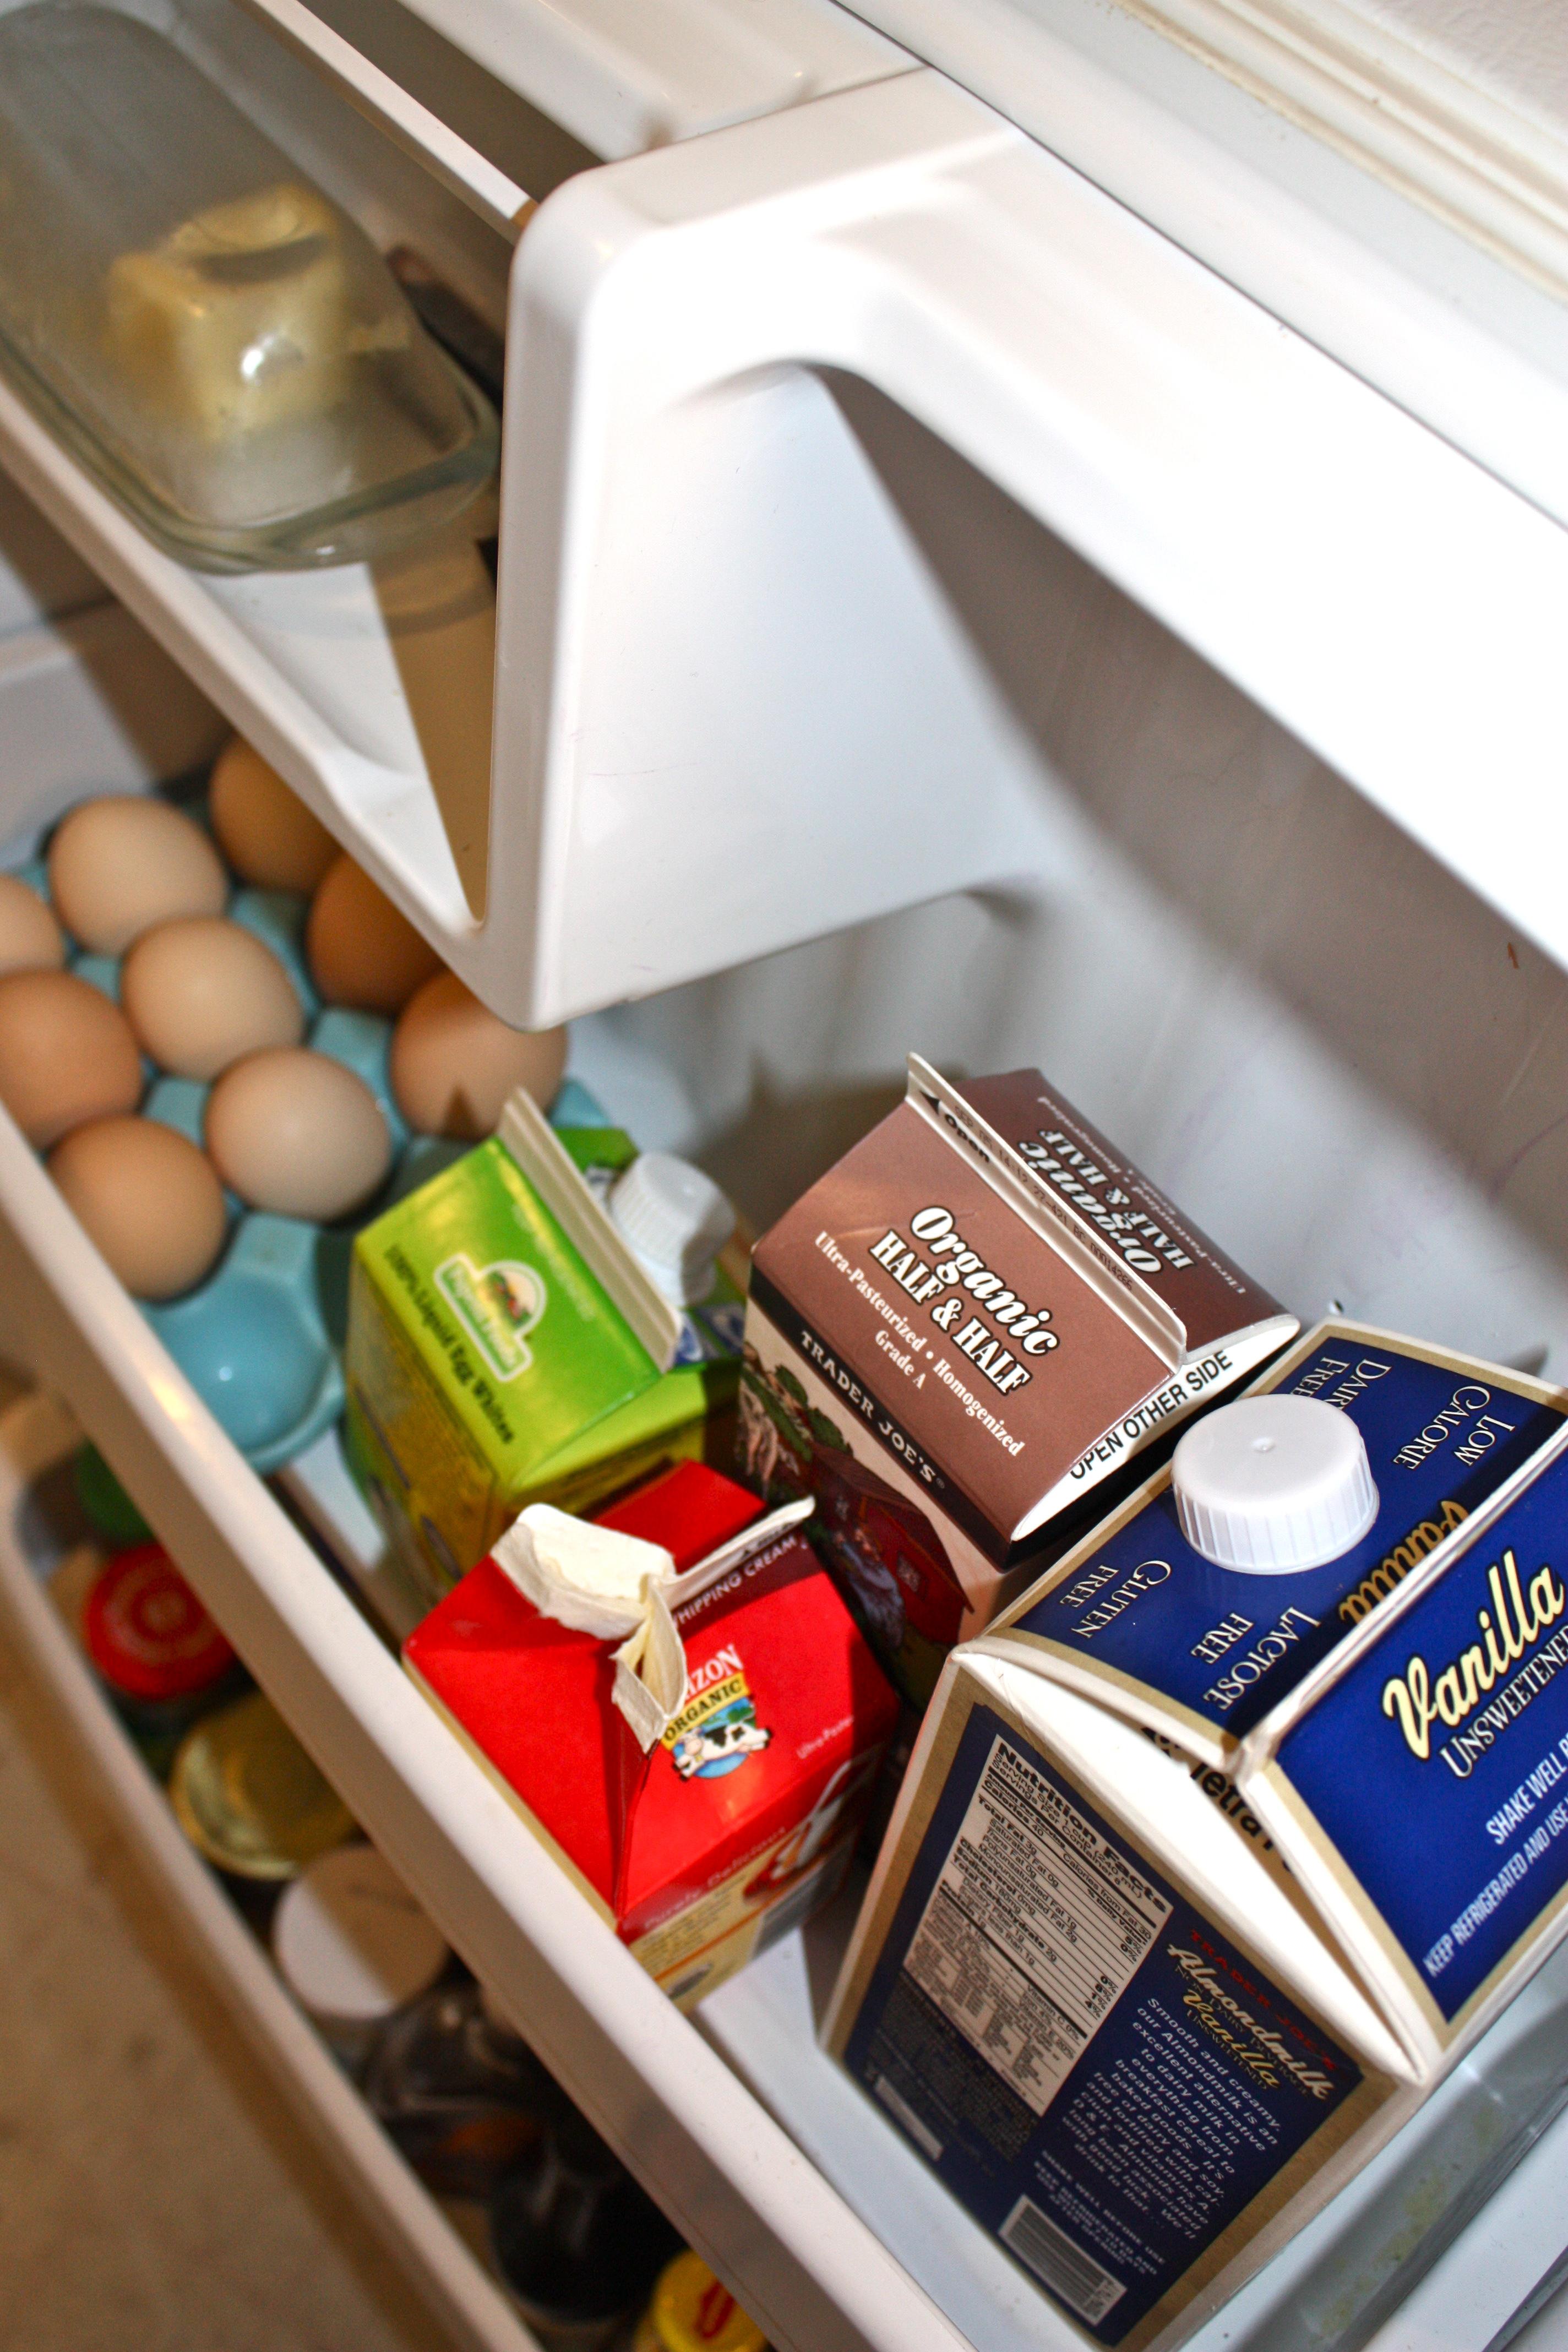 Shelf life of frozen breast milk